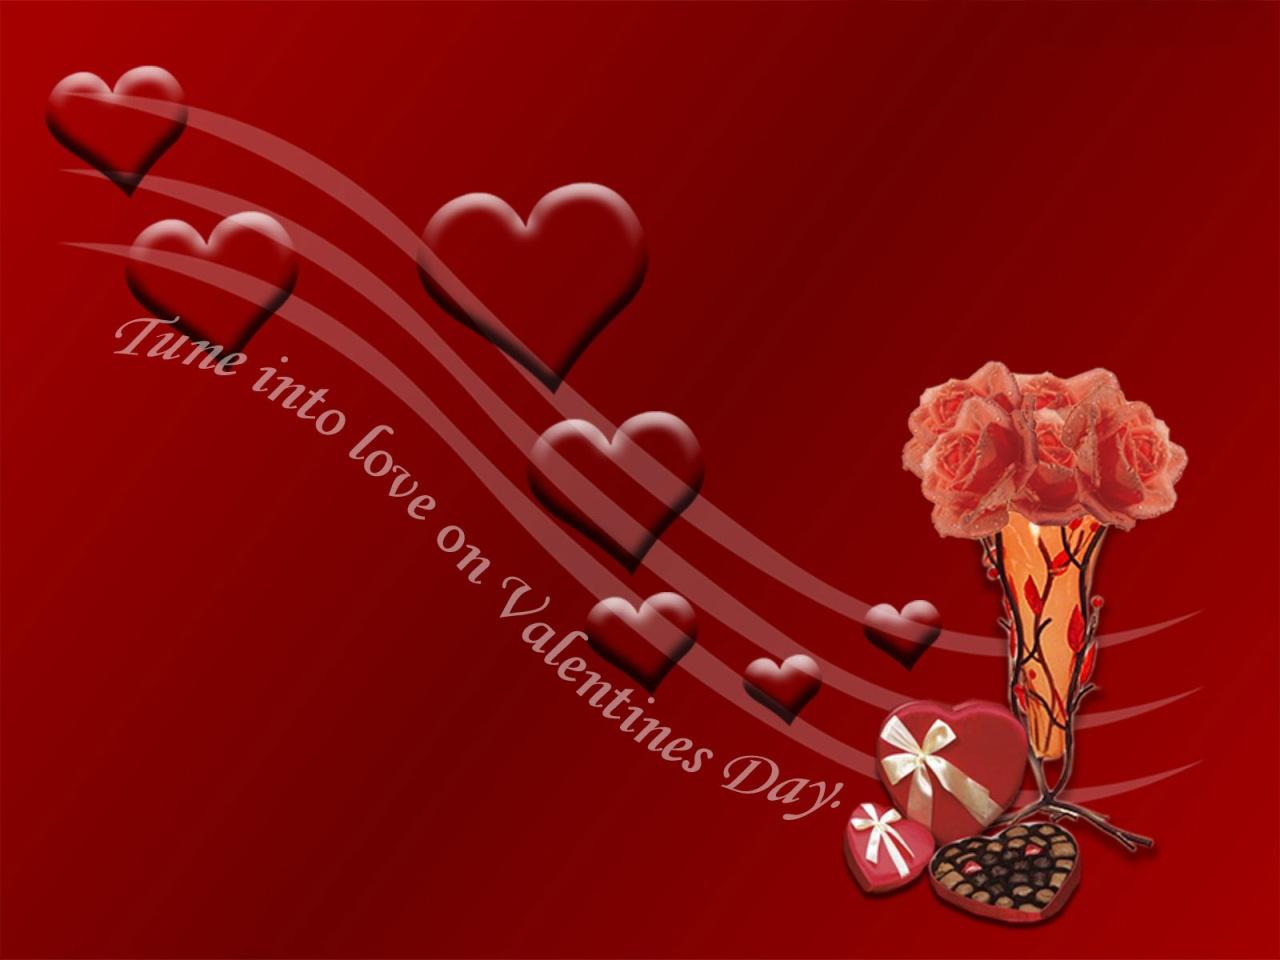 http://3.bp.blogspot.com/_i6co2fwMbTo/TUE_NQC6EDI/AAAAAAAAMq8/IBcCk6vCPto/s1600/wallpaper+Valentines+Day+1.jpg